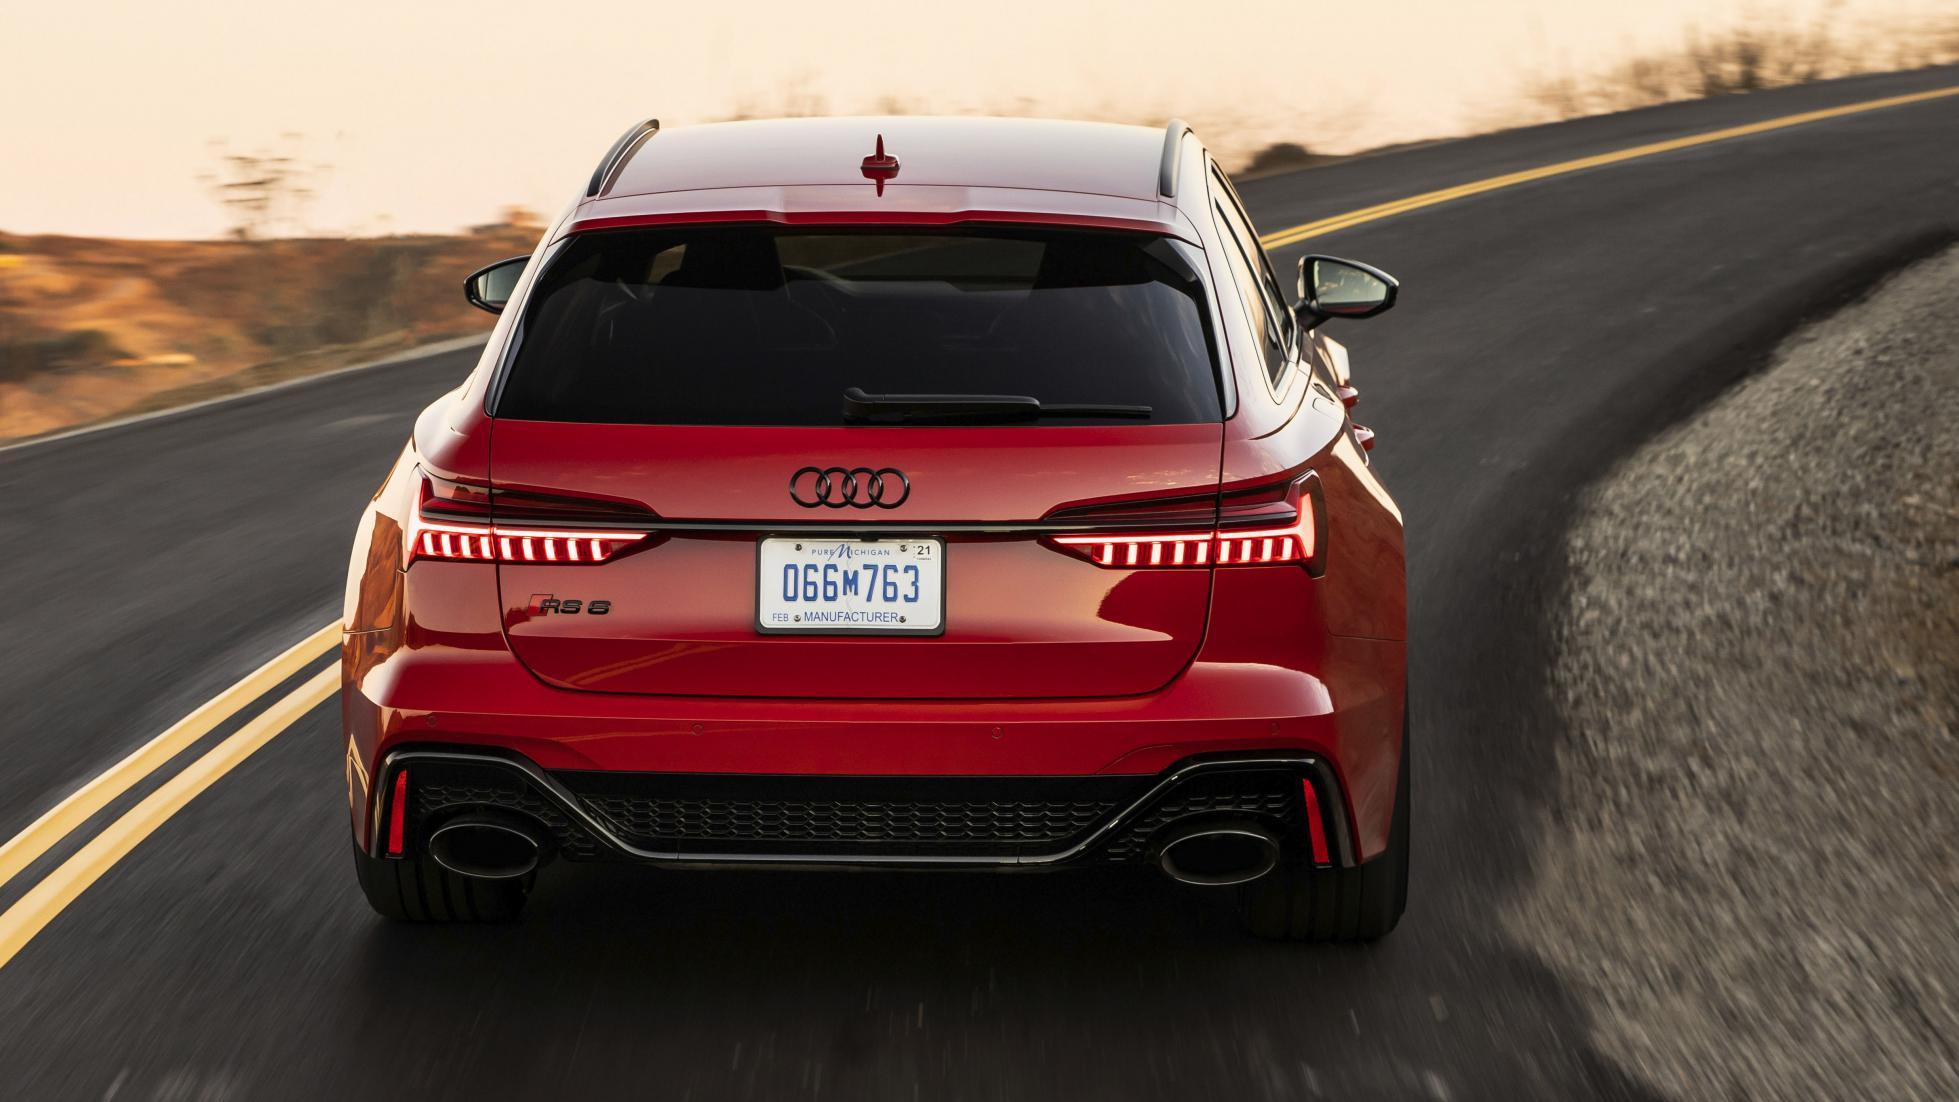 TopGear   Audi RS6 Review: Kneel, puny earthlings